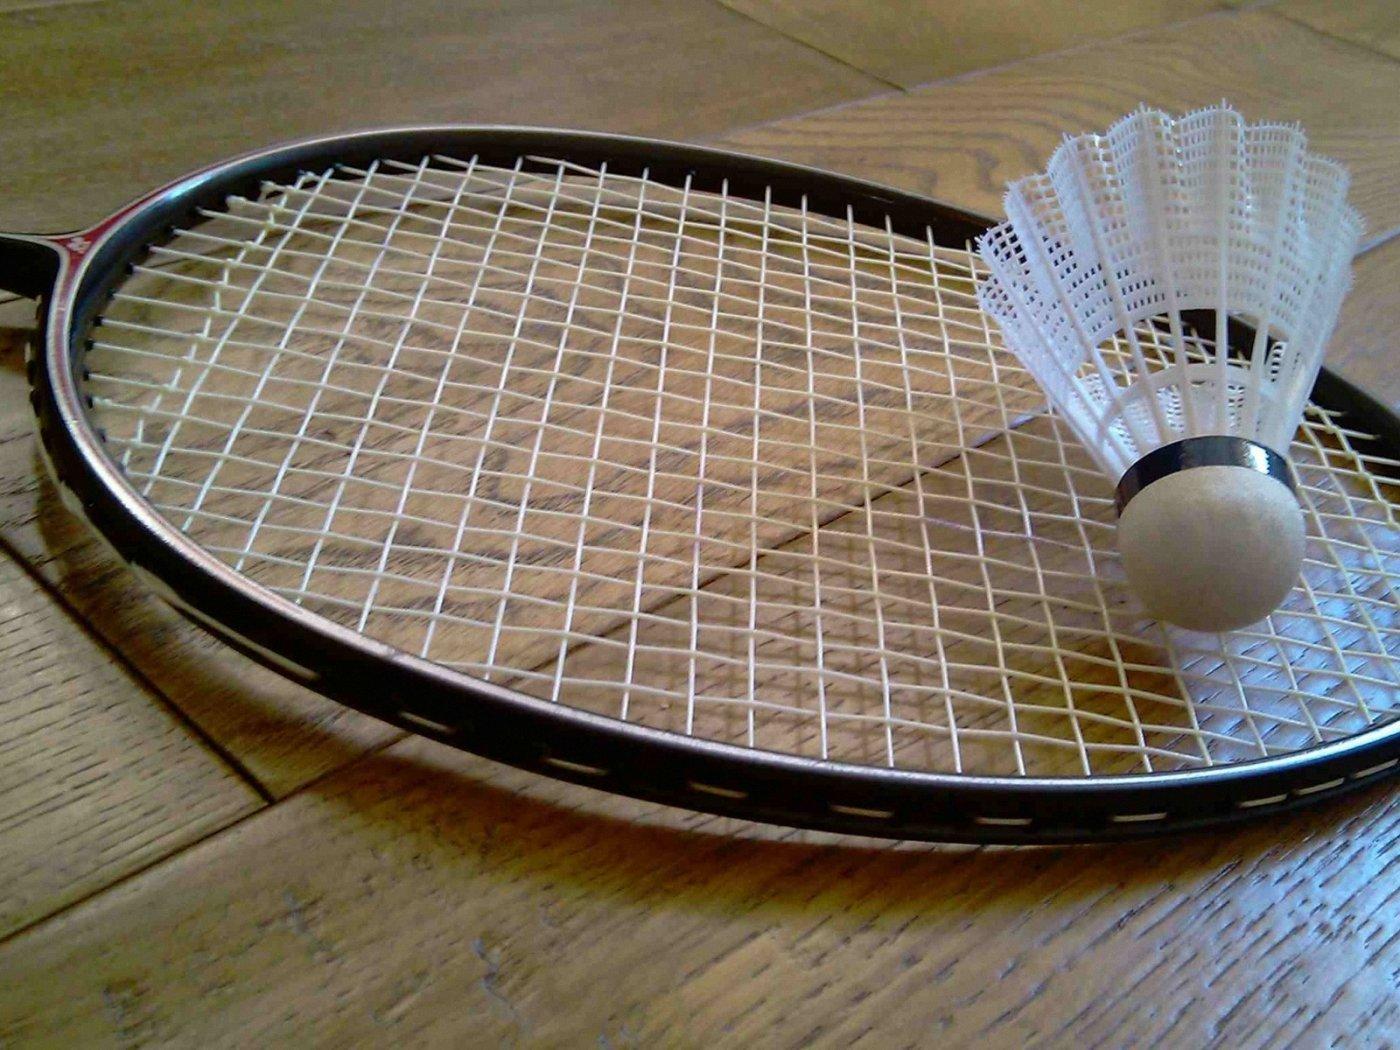 Richtige Badminton-Saite